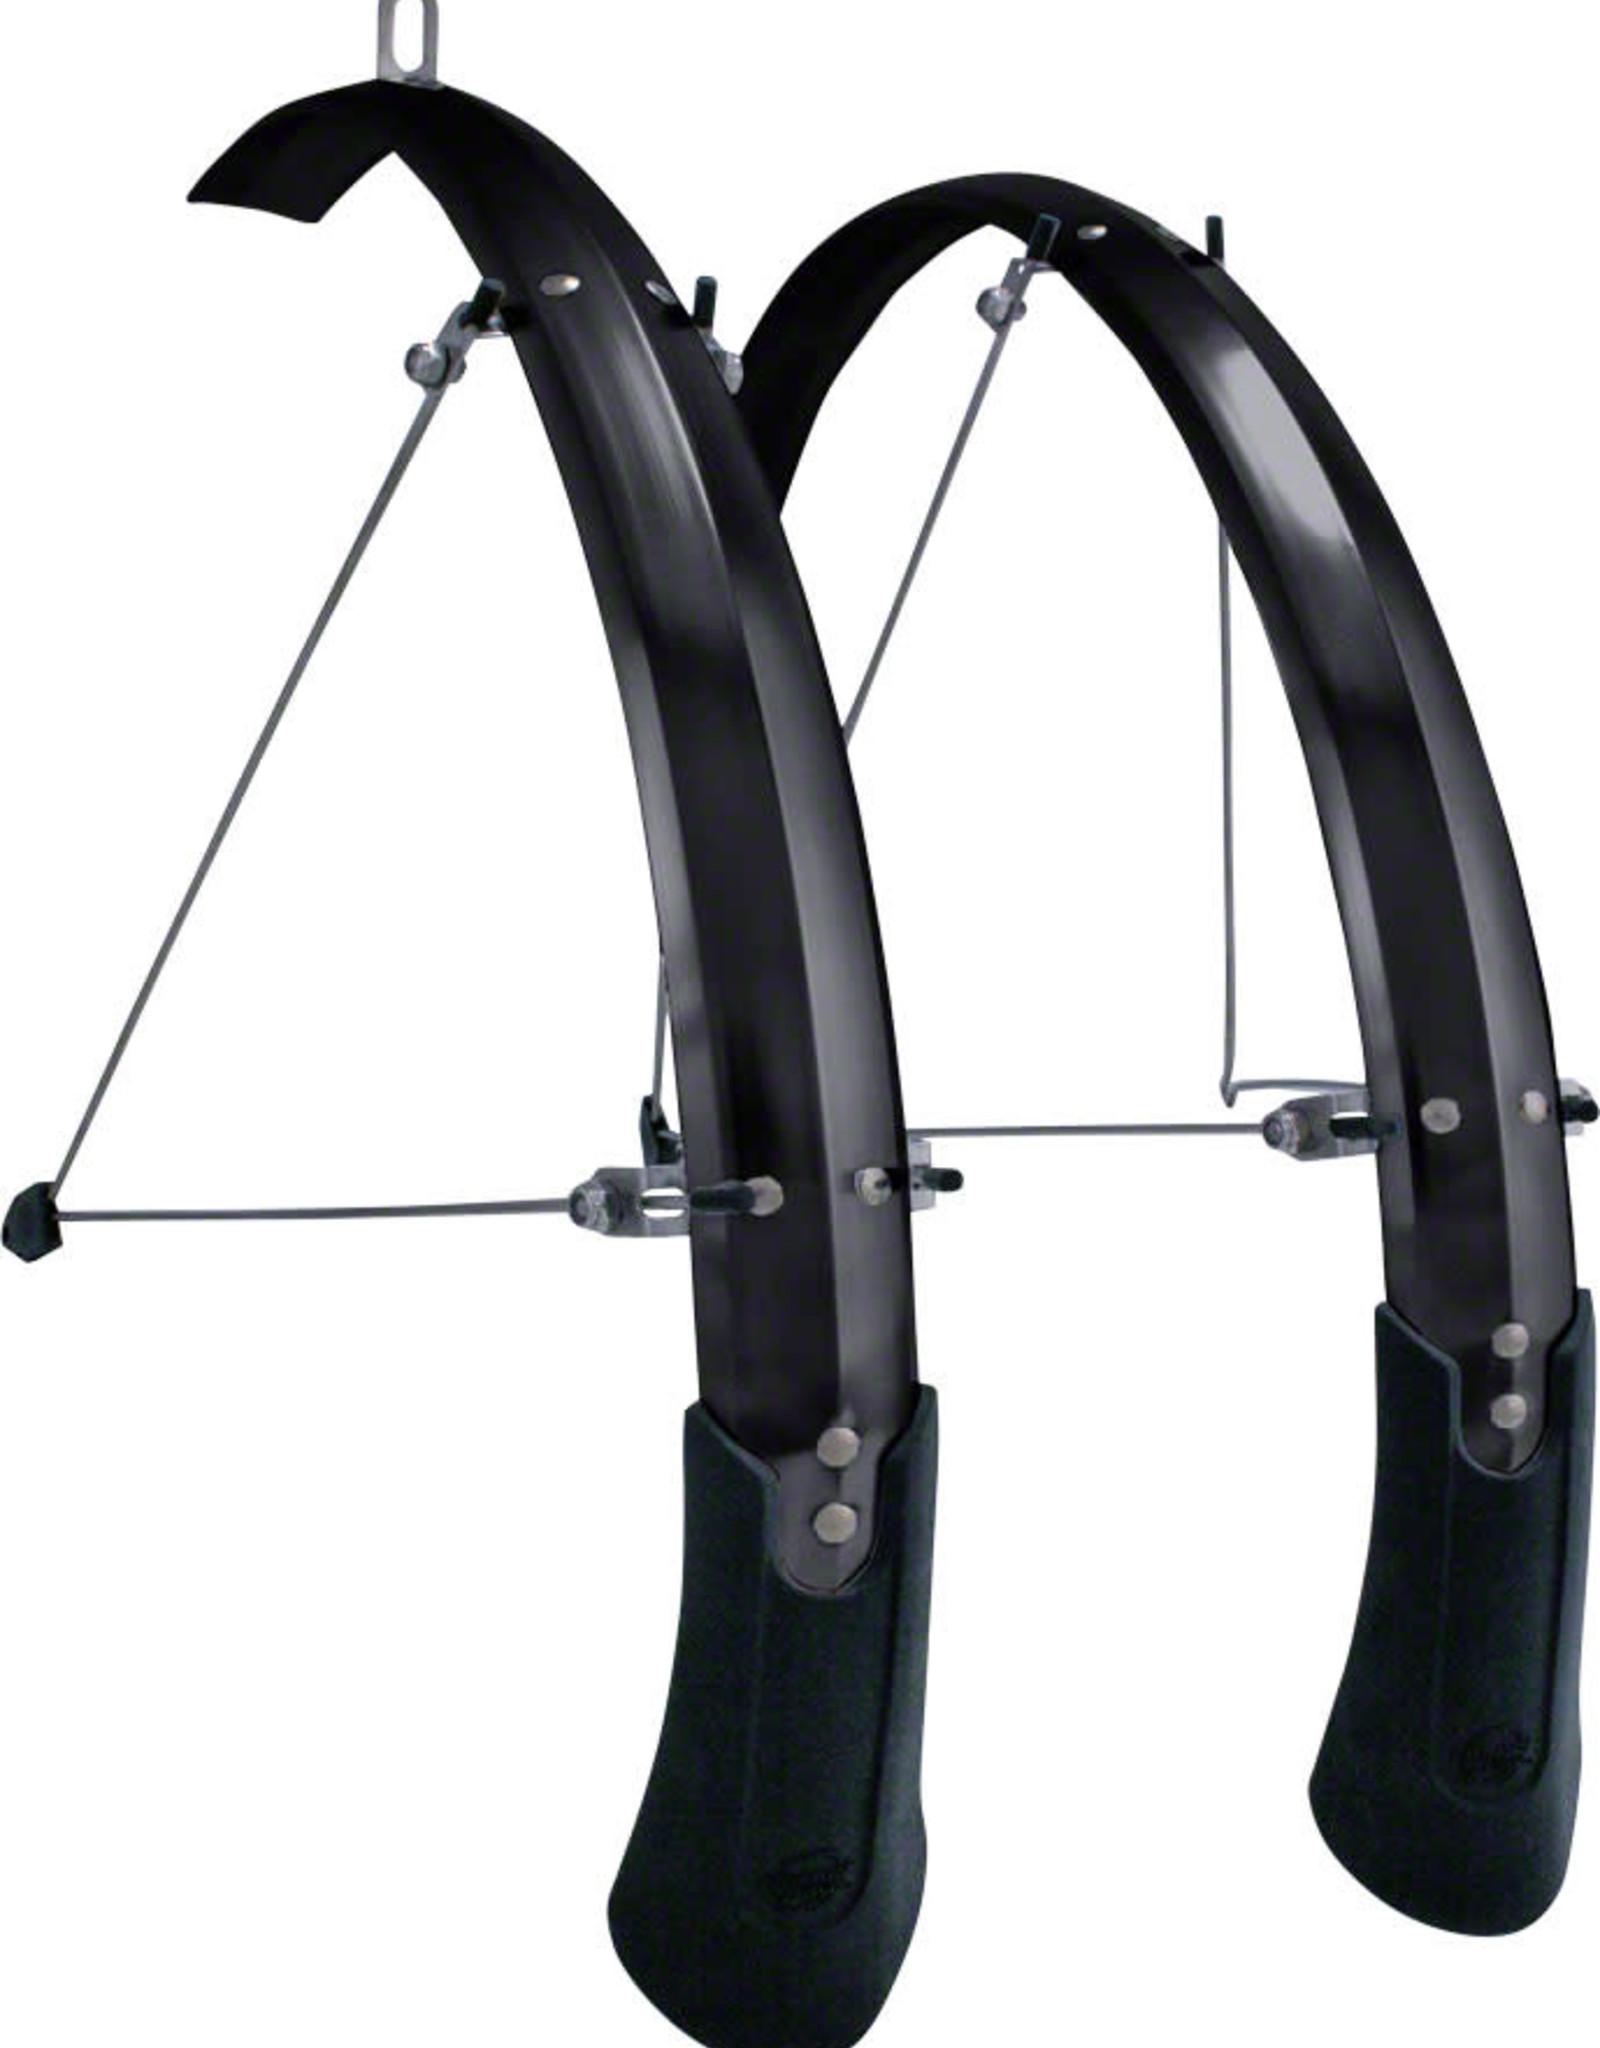 Planet Bike Cascadia ALX 700c x 50 Fender Set: Black (tire sizes 700c x 30-40)